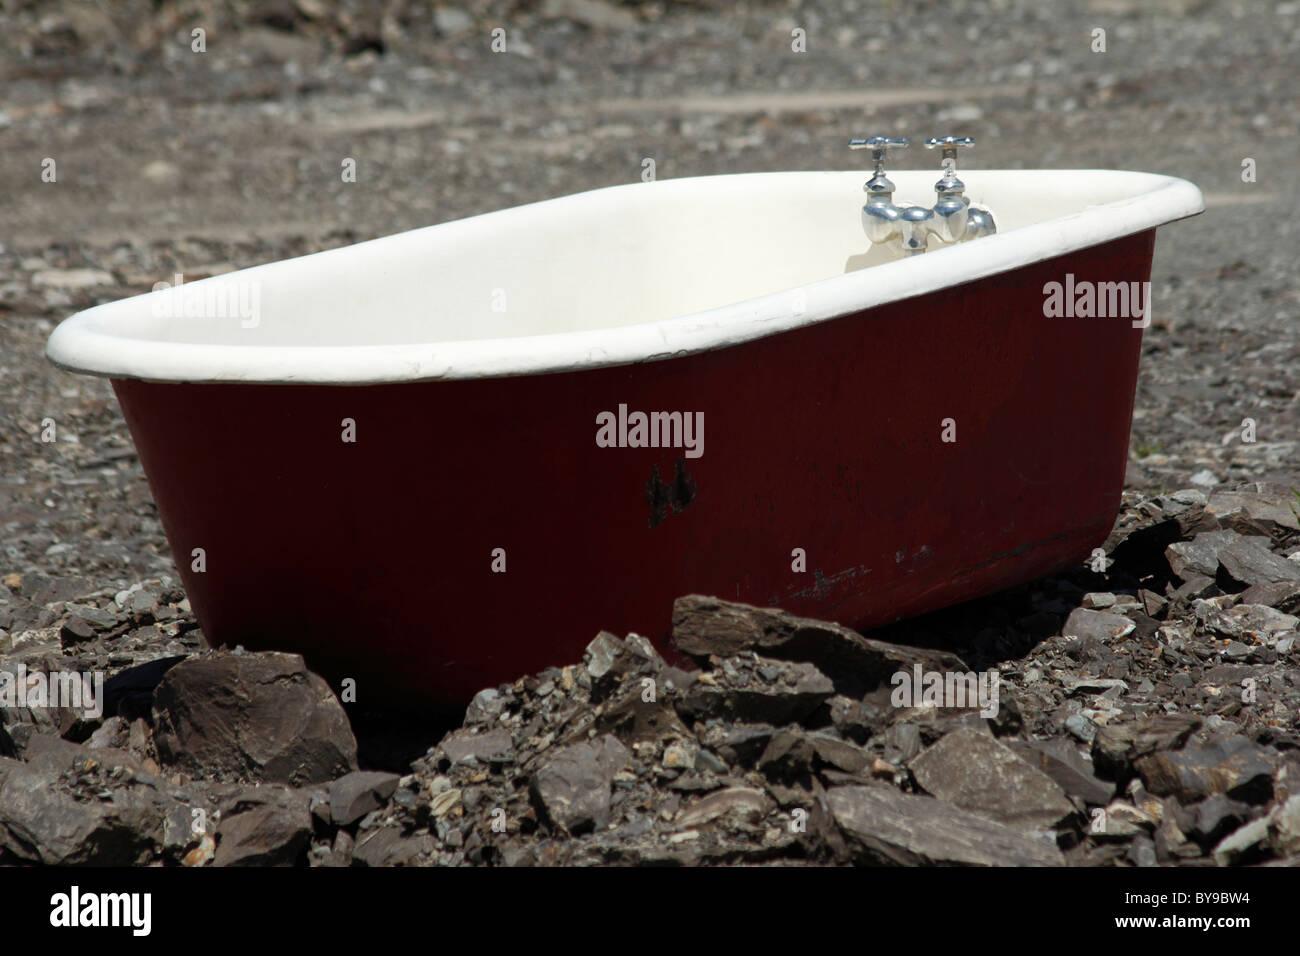 Old Bath Tub Stock Photos & Old Bath Tub Stock Images - Alamy